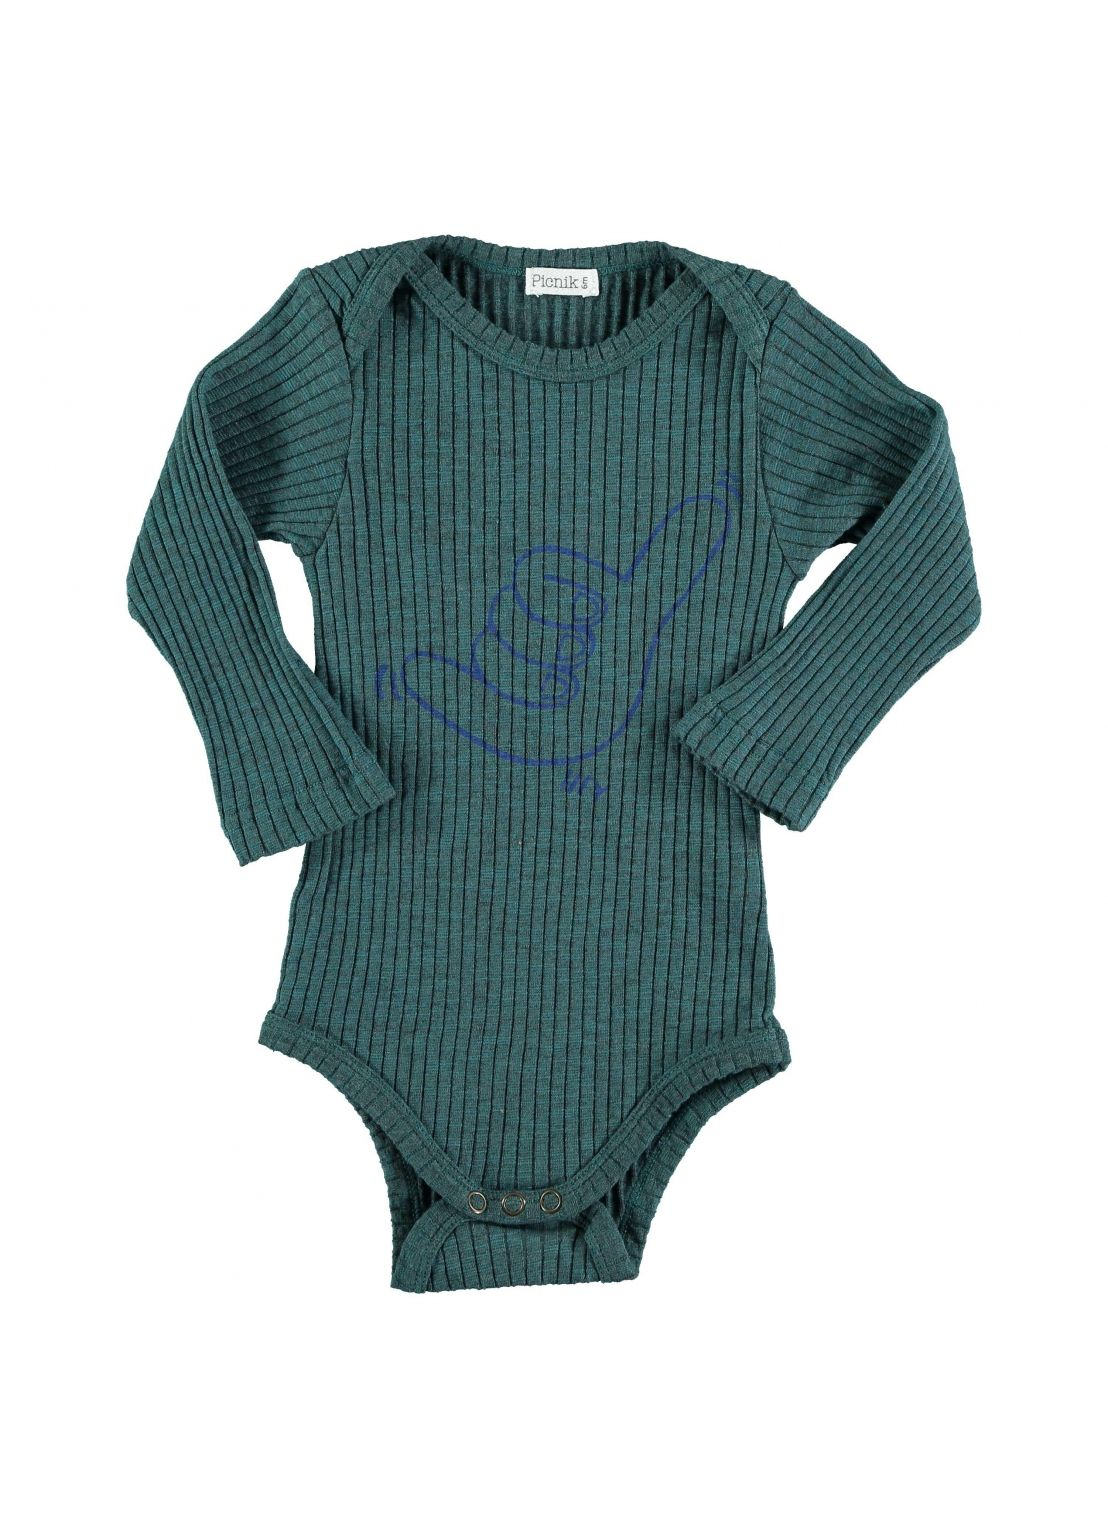 Baby ROMPER Unisex-Cotton 23% Poliester 3% Elastan- knitted